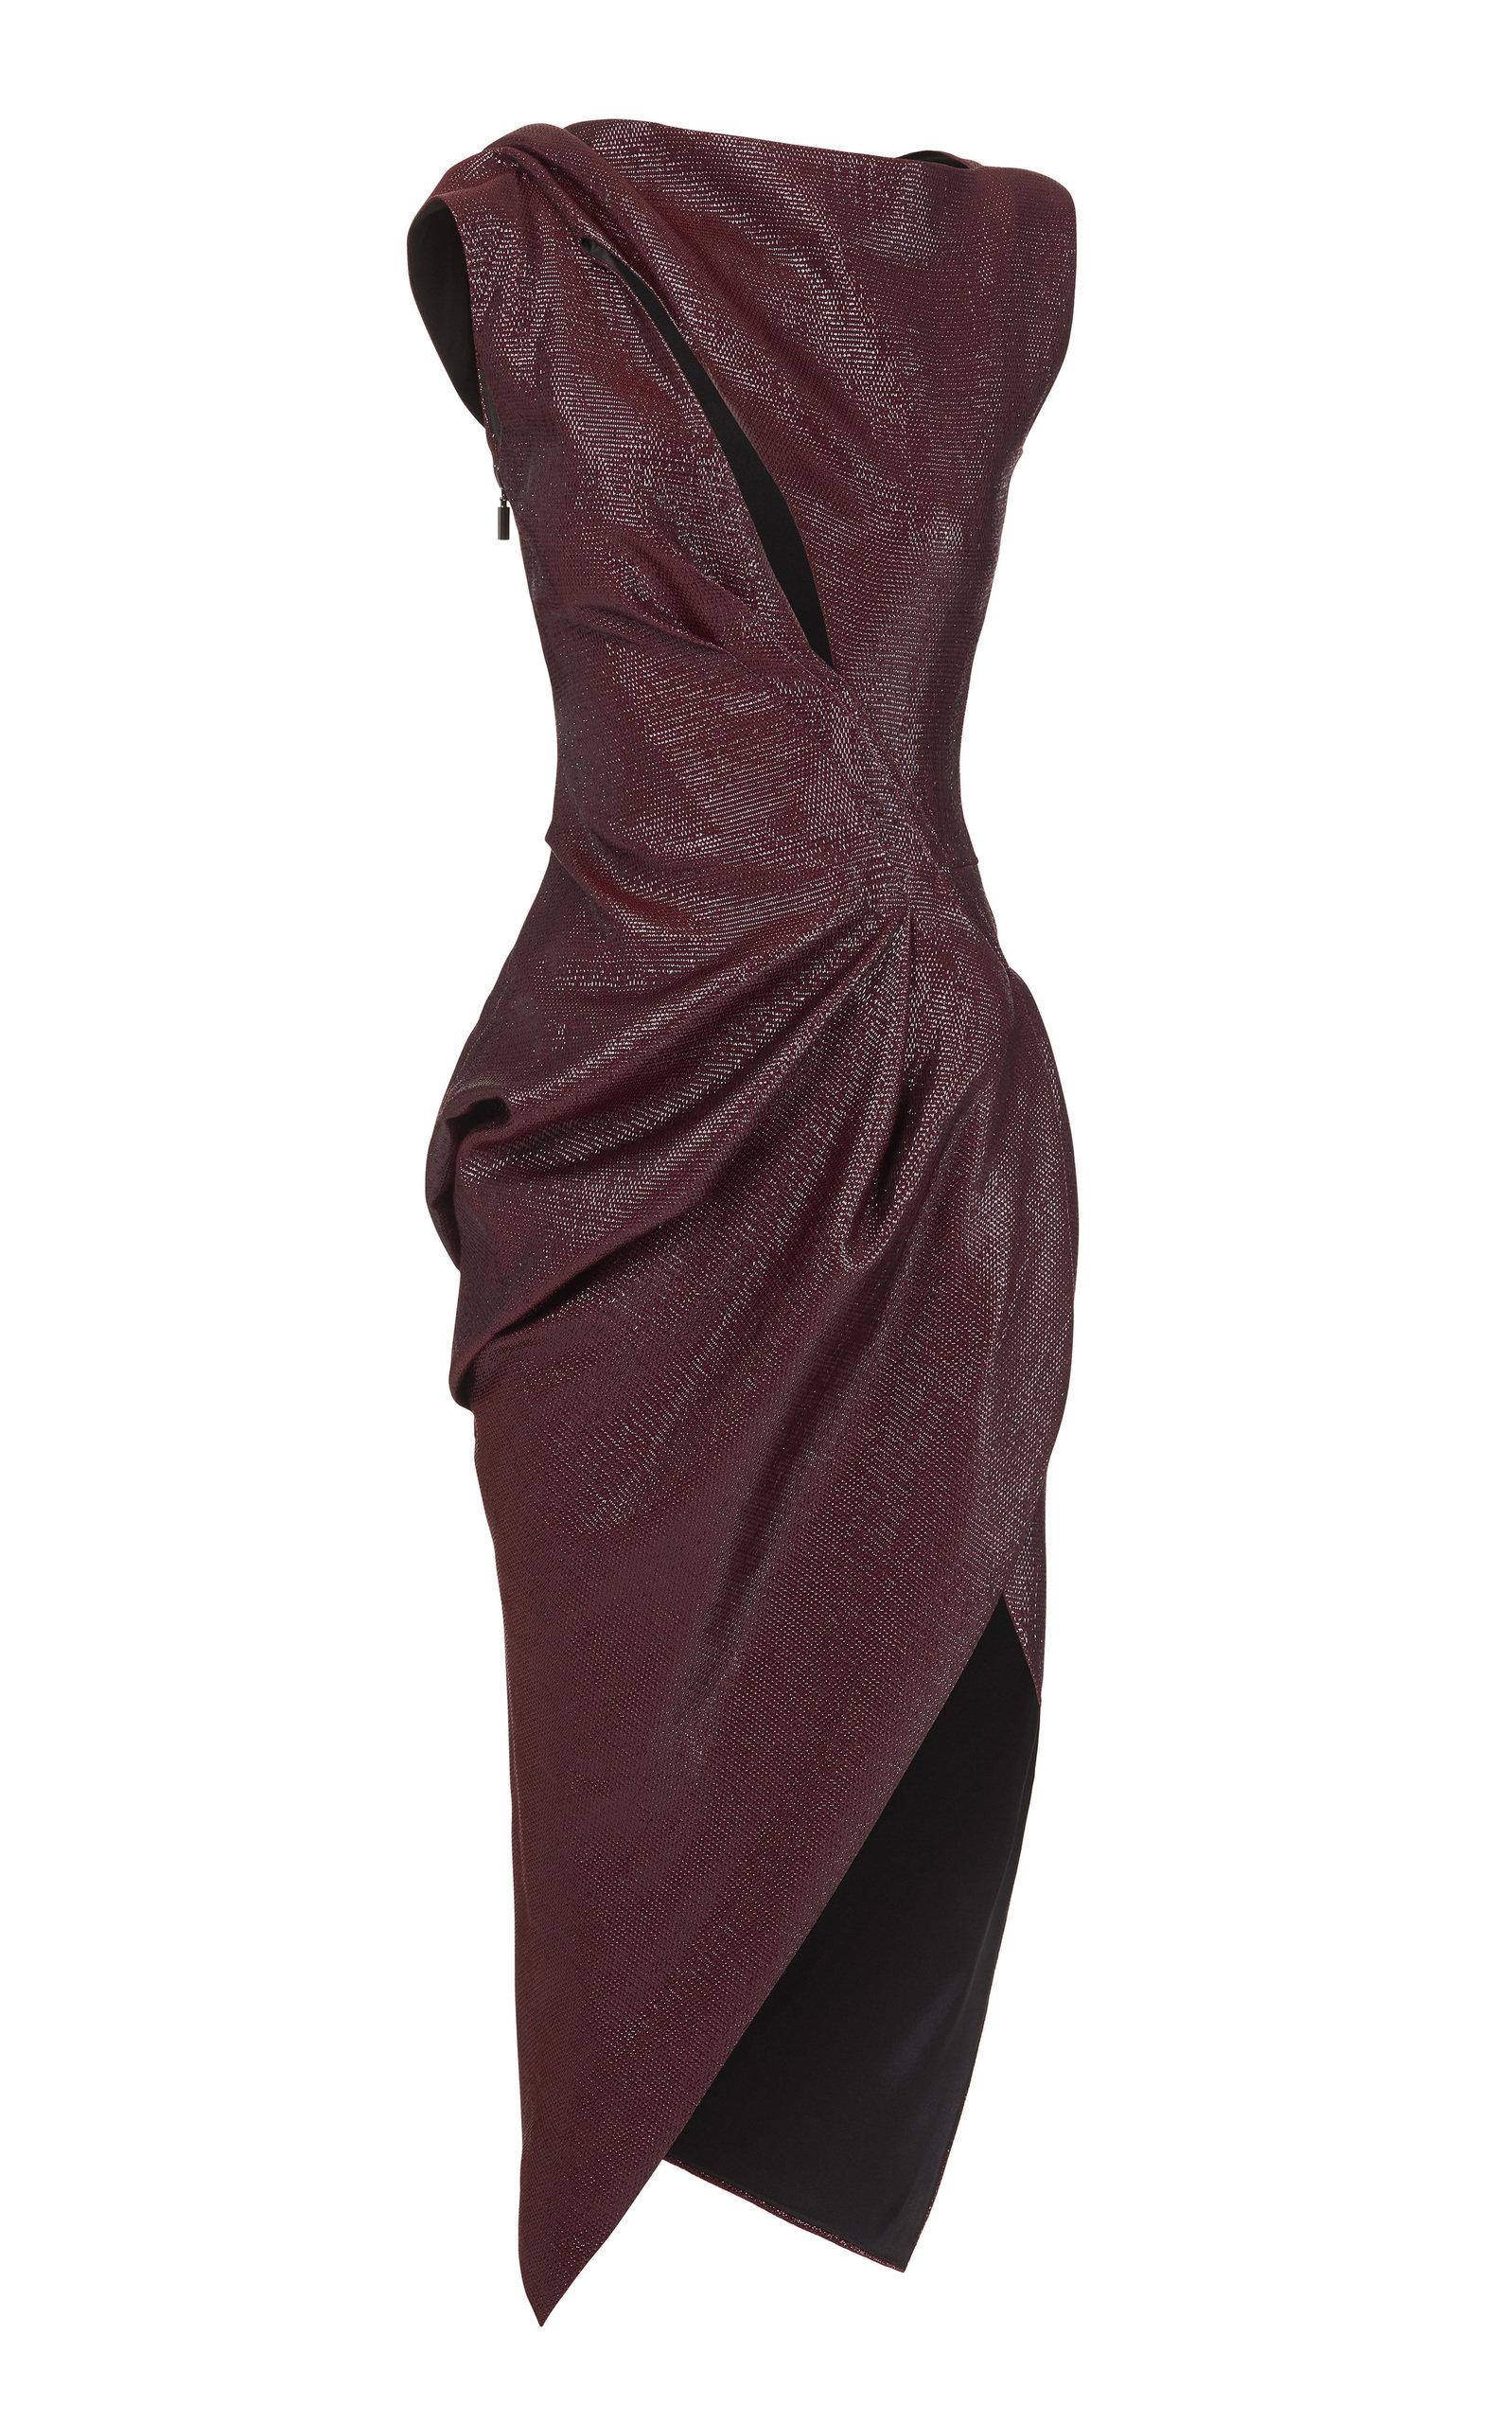 Buy Maticevski Connector Gathered Cady Dress online, shop Maticevski at the best price